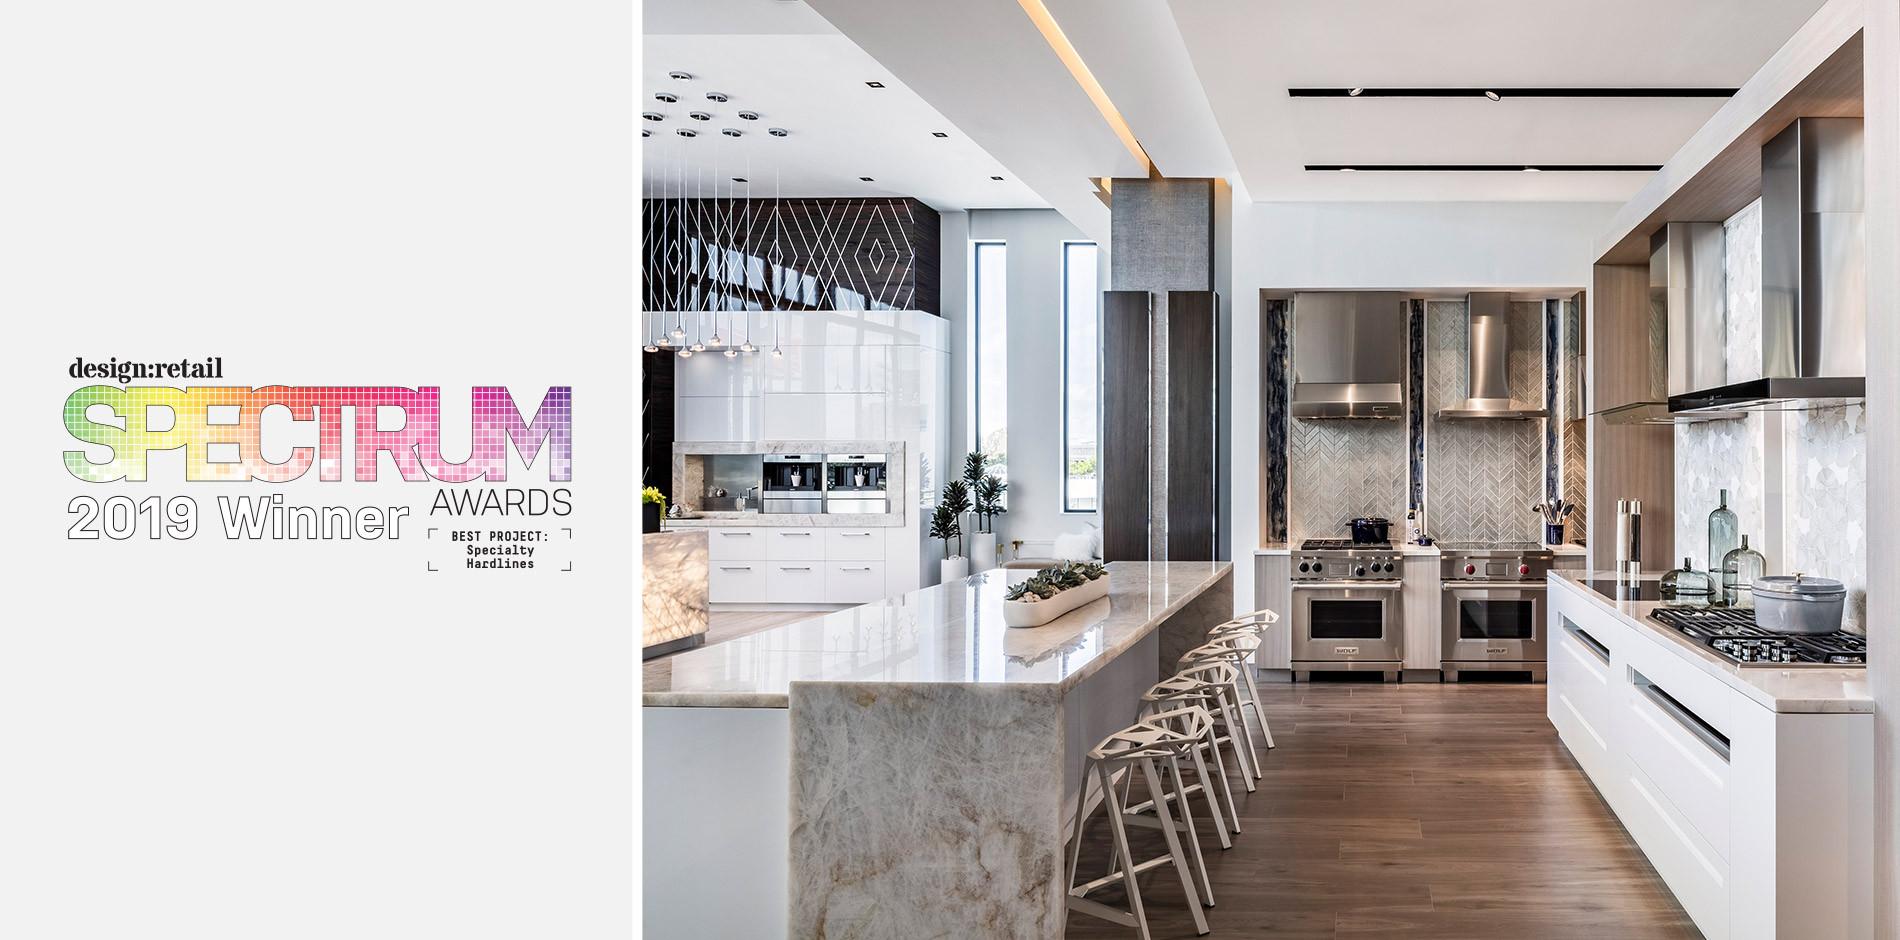 Sub Zero Wolf And Cove Miami Showroom Wins Design Retail Spectrum